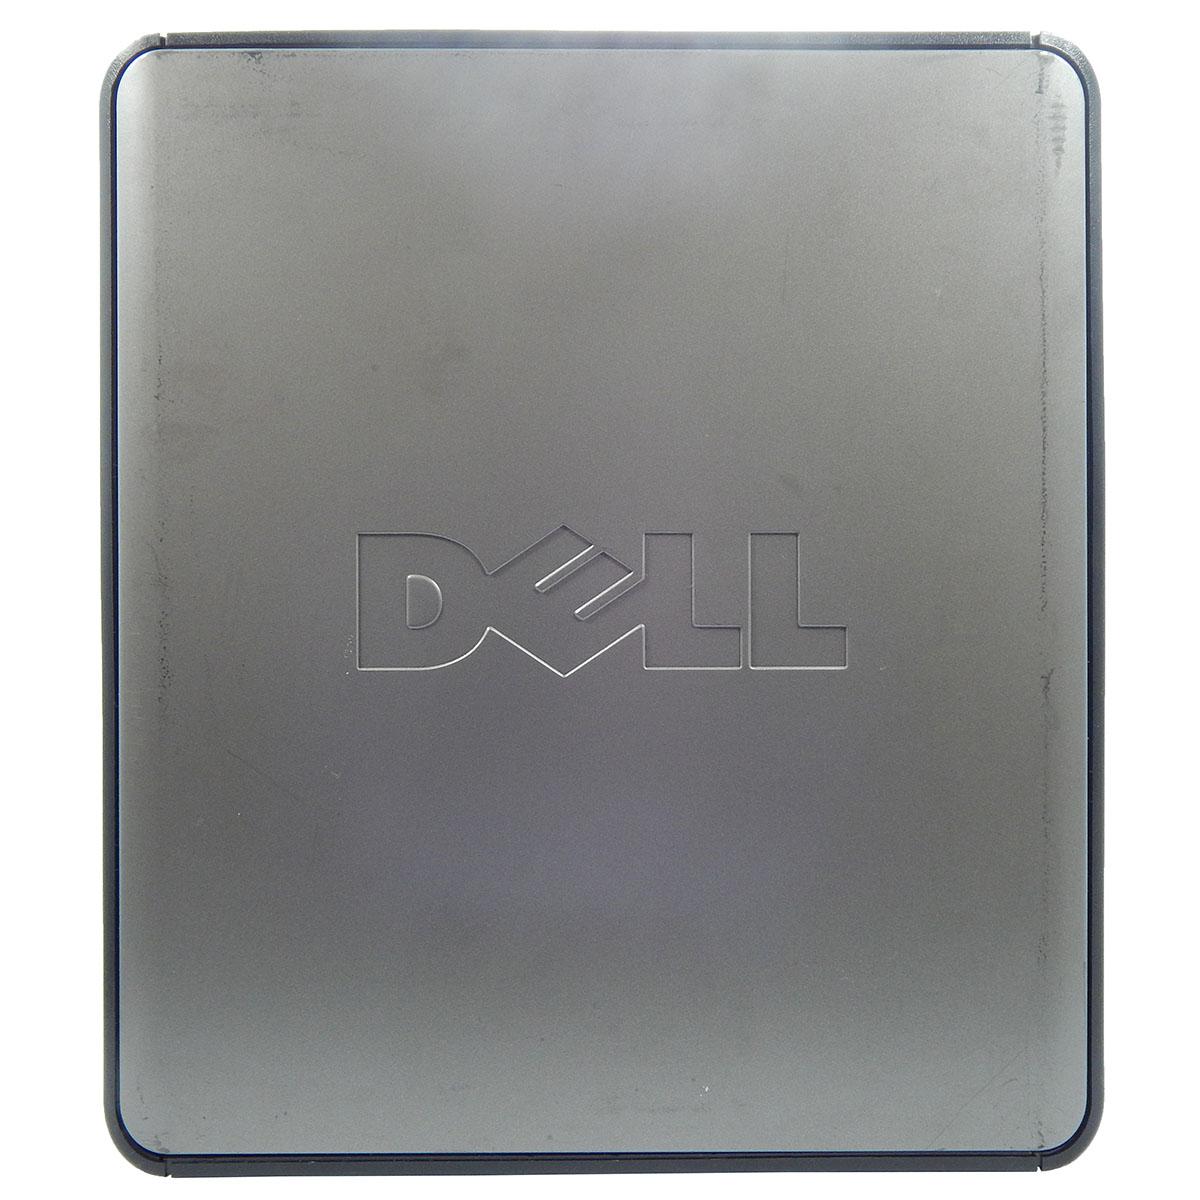 PC Dell GX620 Pentium 4 2.8GHz - 2Gb - 80Gb